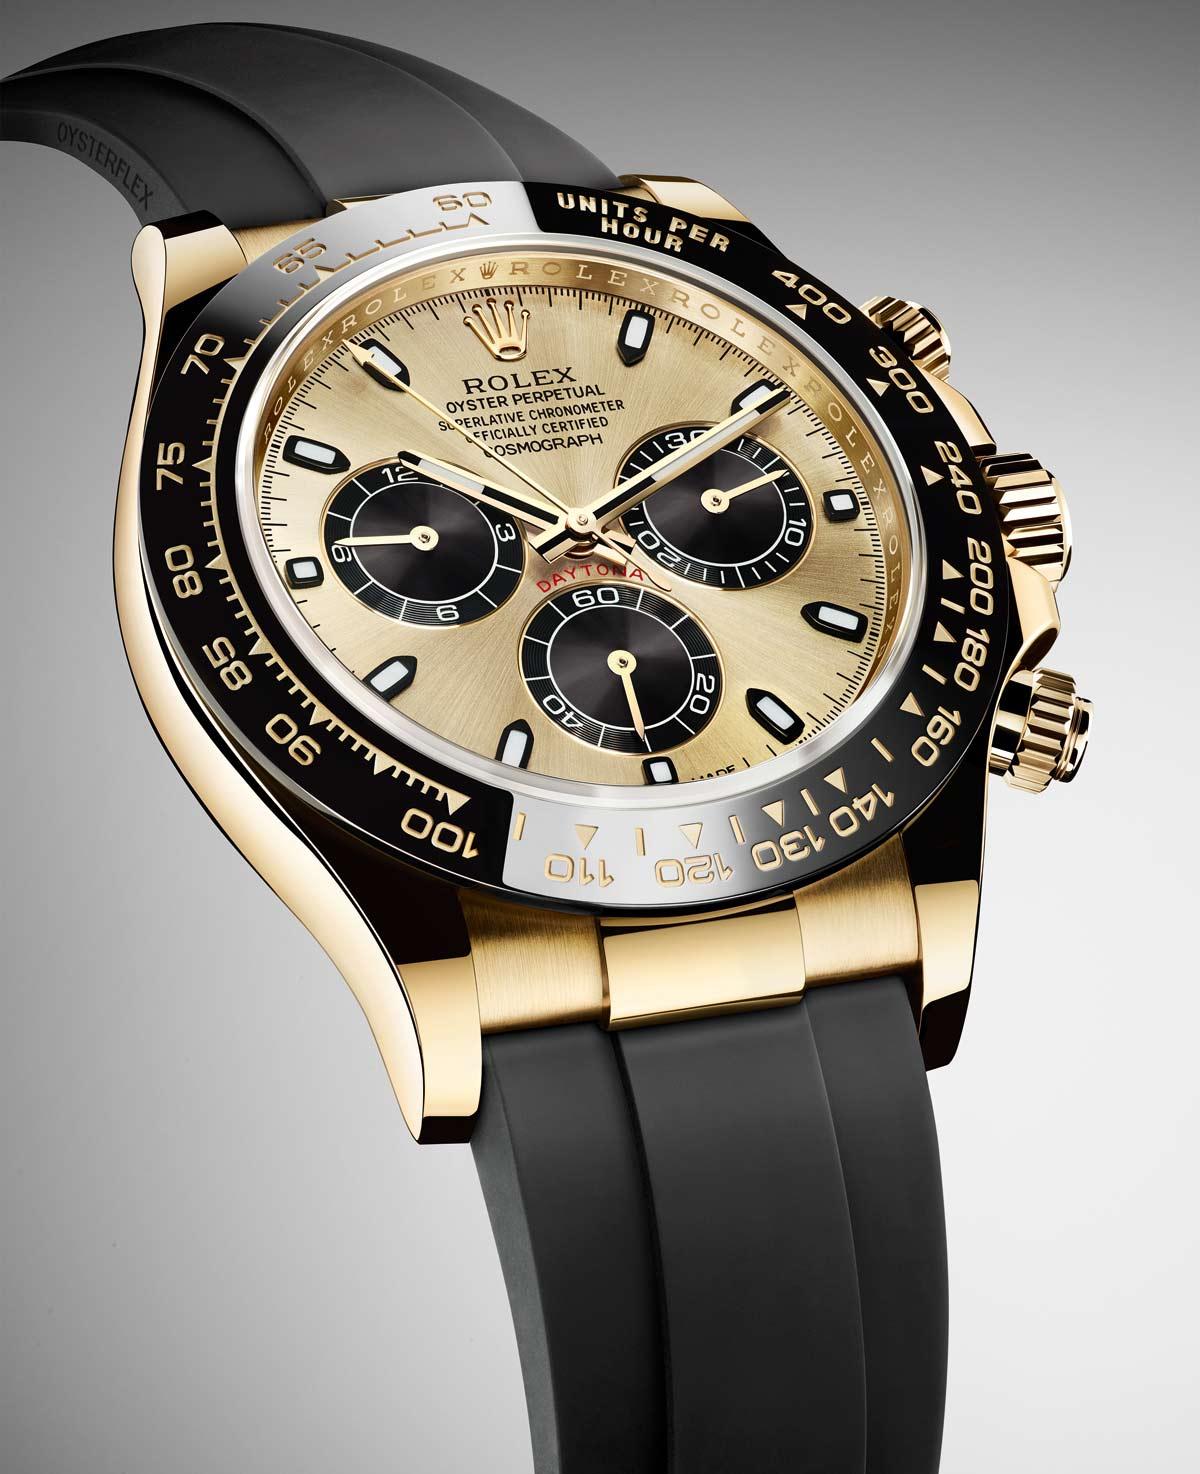 Rolex cosmograph daytona with oysterflex bracelet time and watches for Rolex cosmograph daytona